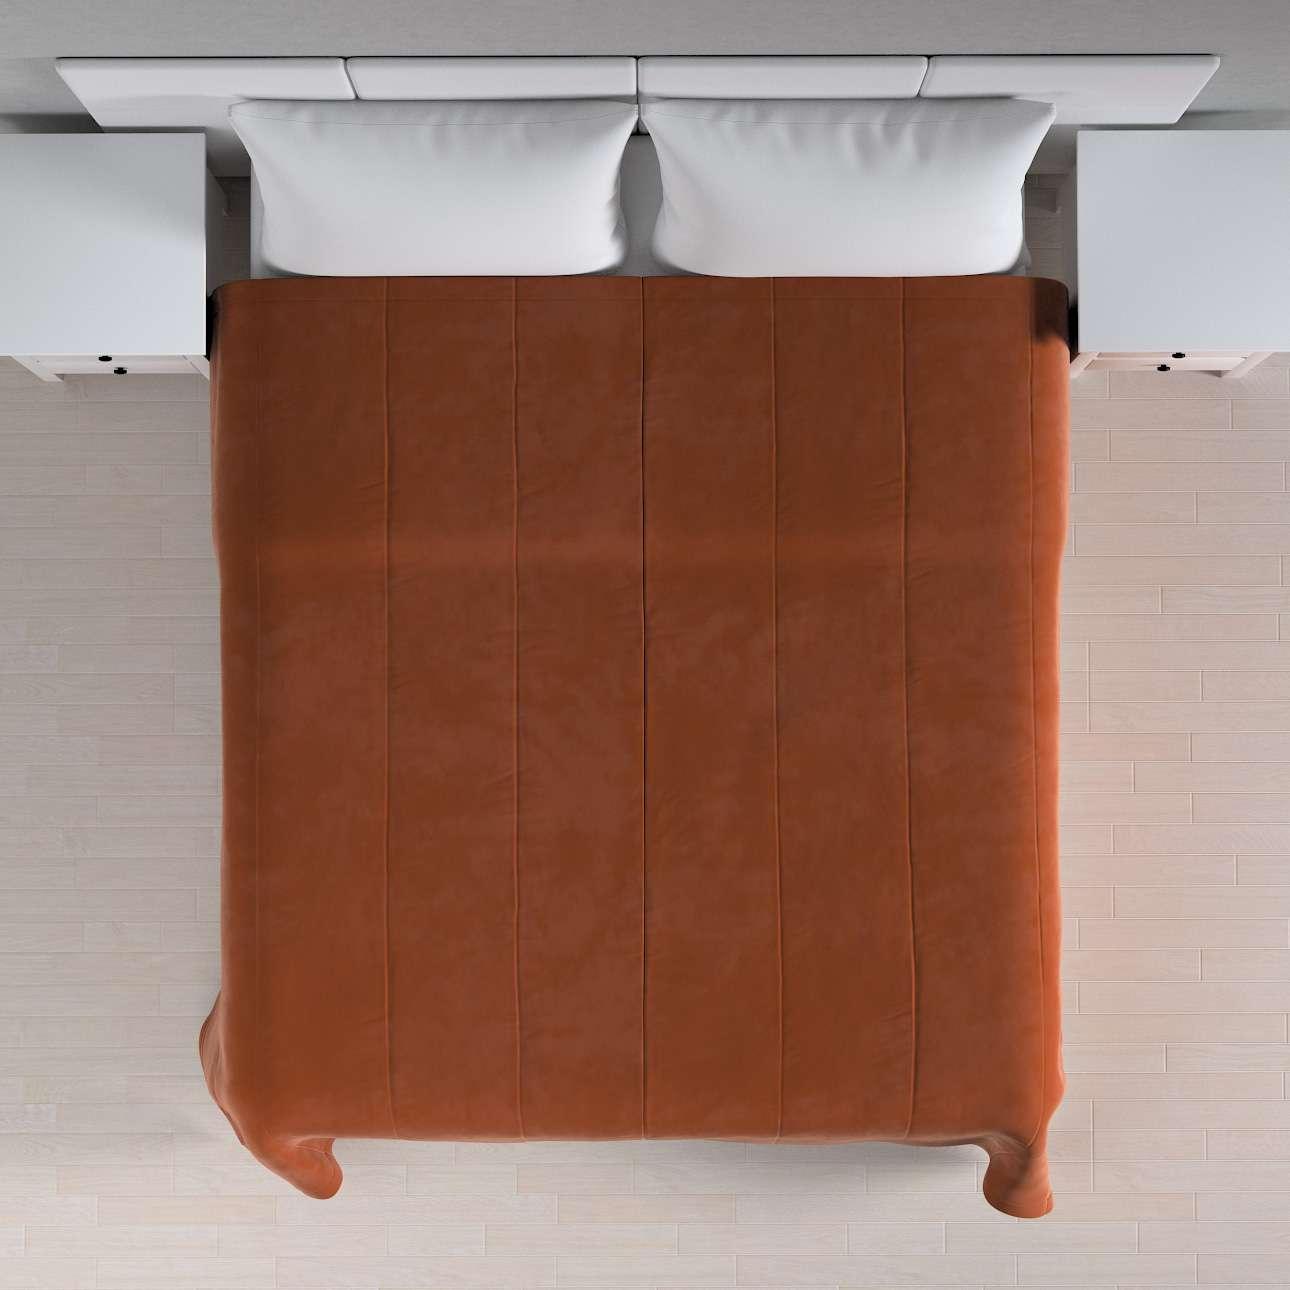 Narzuta pikowana w pasy Velvet 260 x 240 cm w kolekcji Velvet, tkanina: 704-33